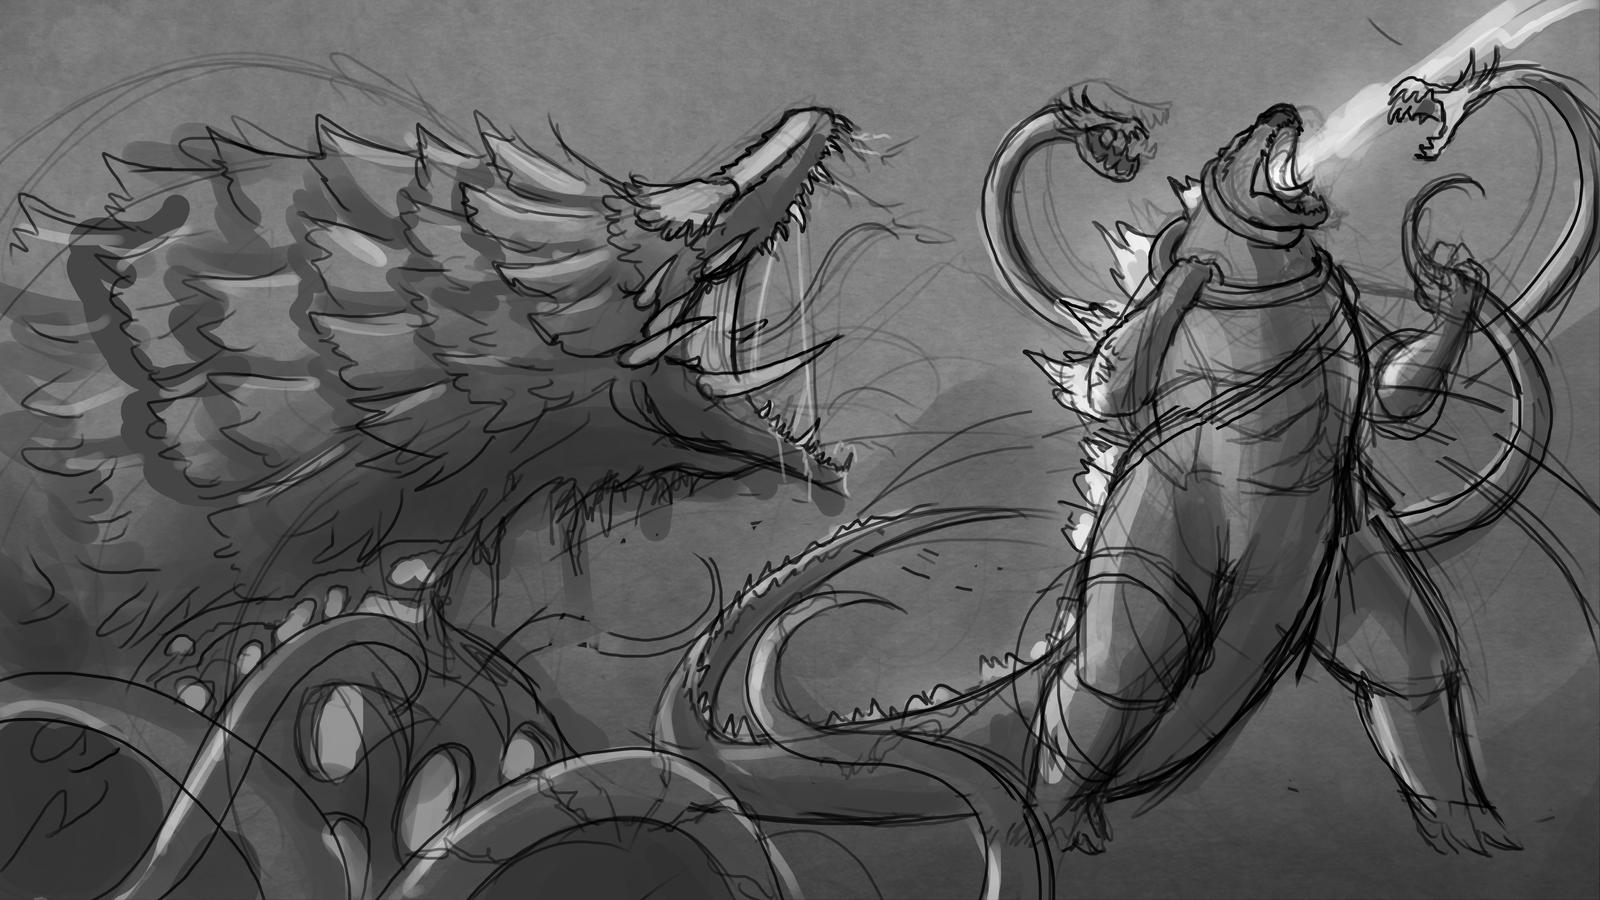 Sketch - Godzilla VS. Biollante By Sawuinhaff On DeviantArt